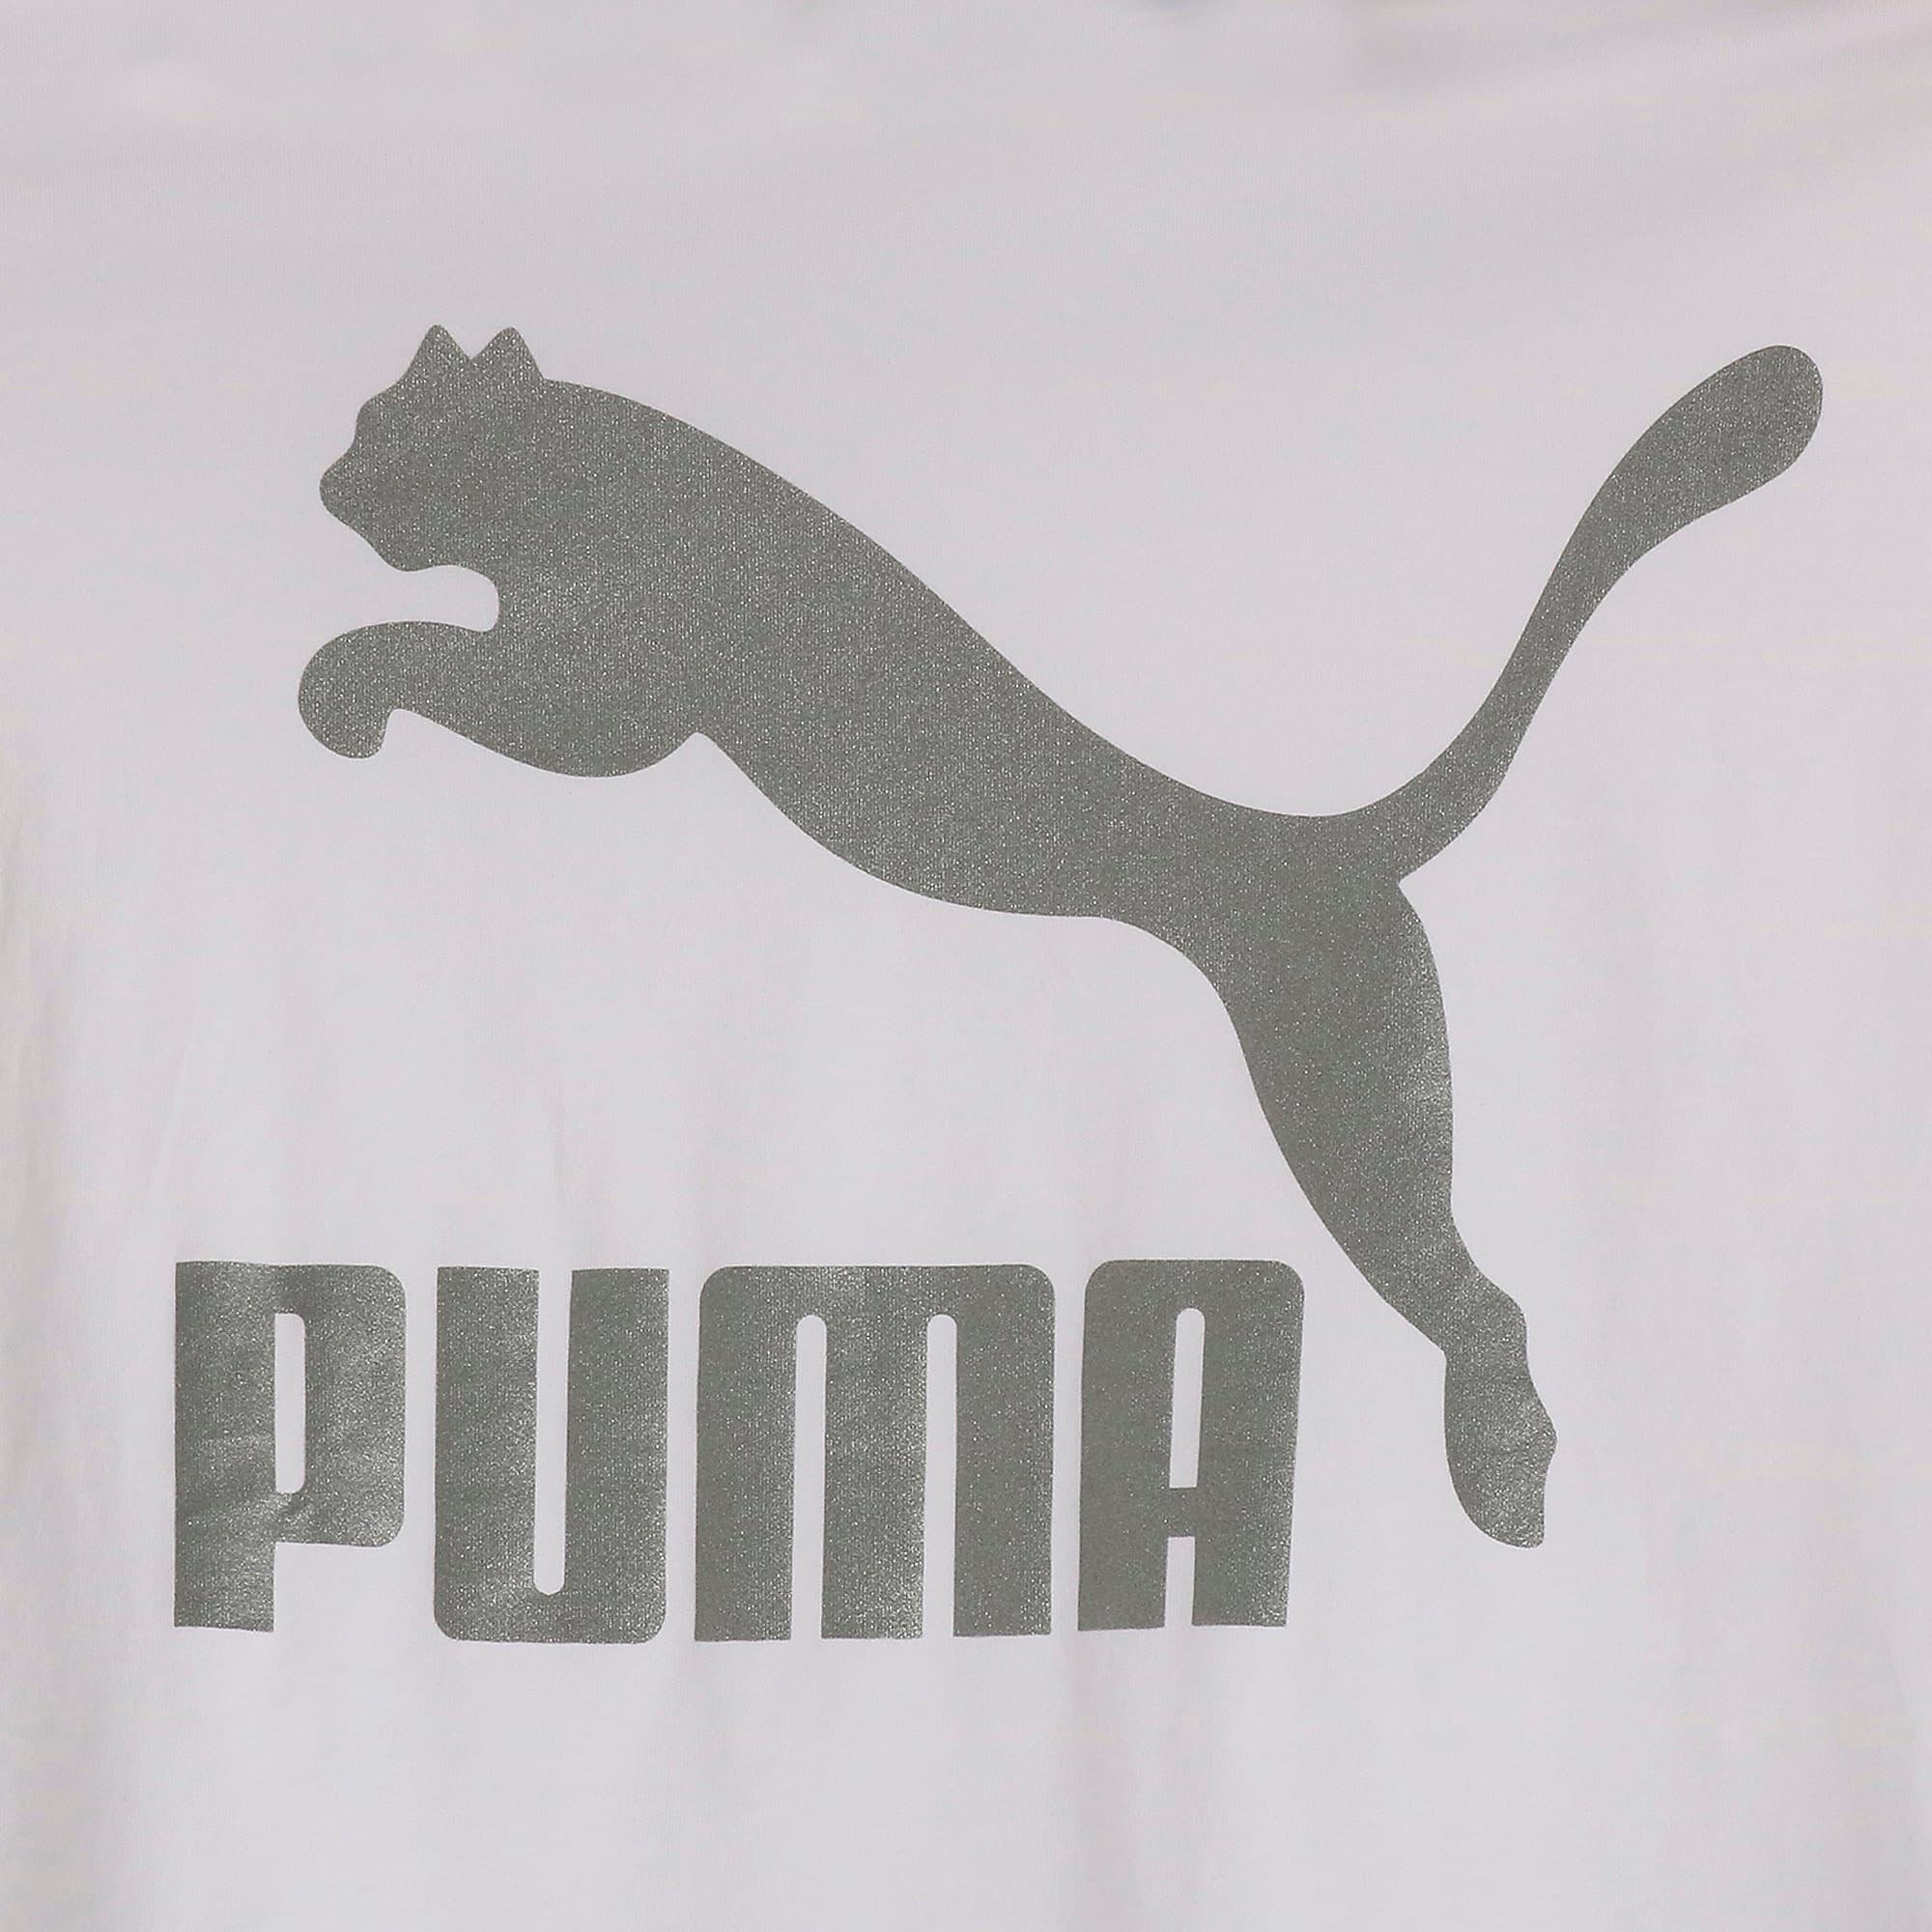 Thumbnail 6 of CLASSICS ロゴ ウィメンズ SS Tシャツ 半袖, Puma White-metal, medium-JPN